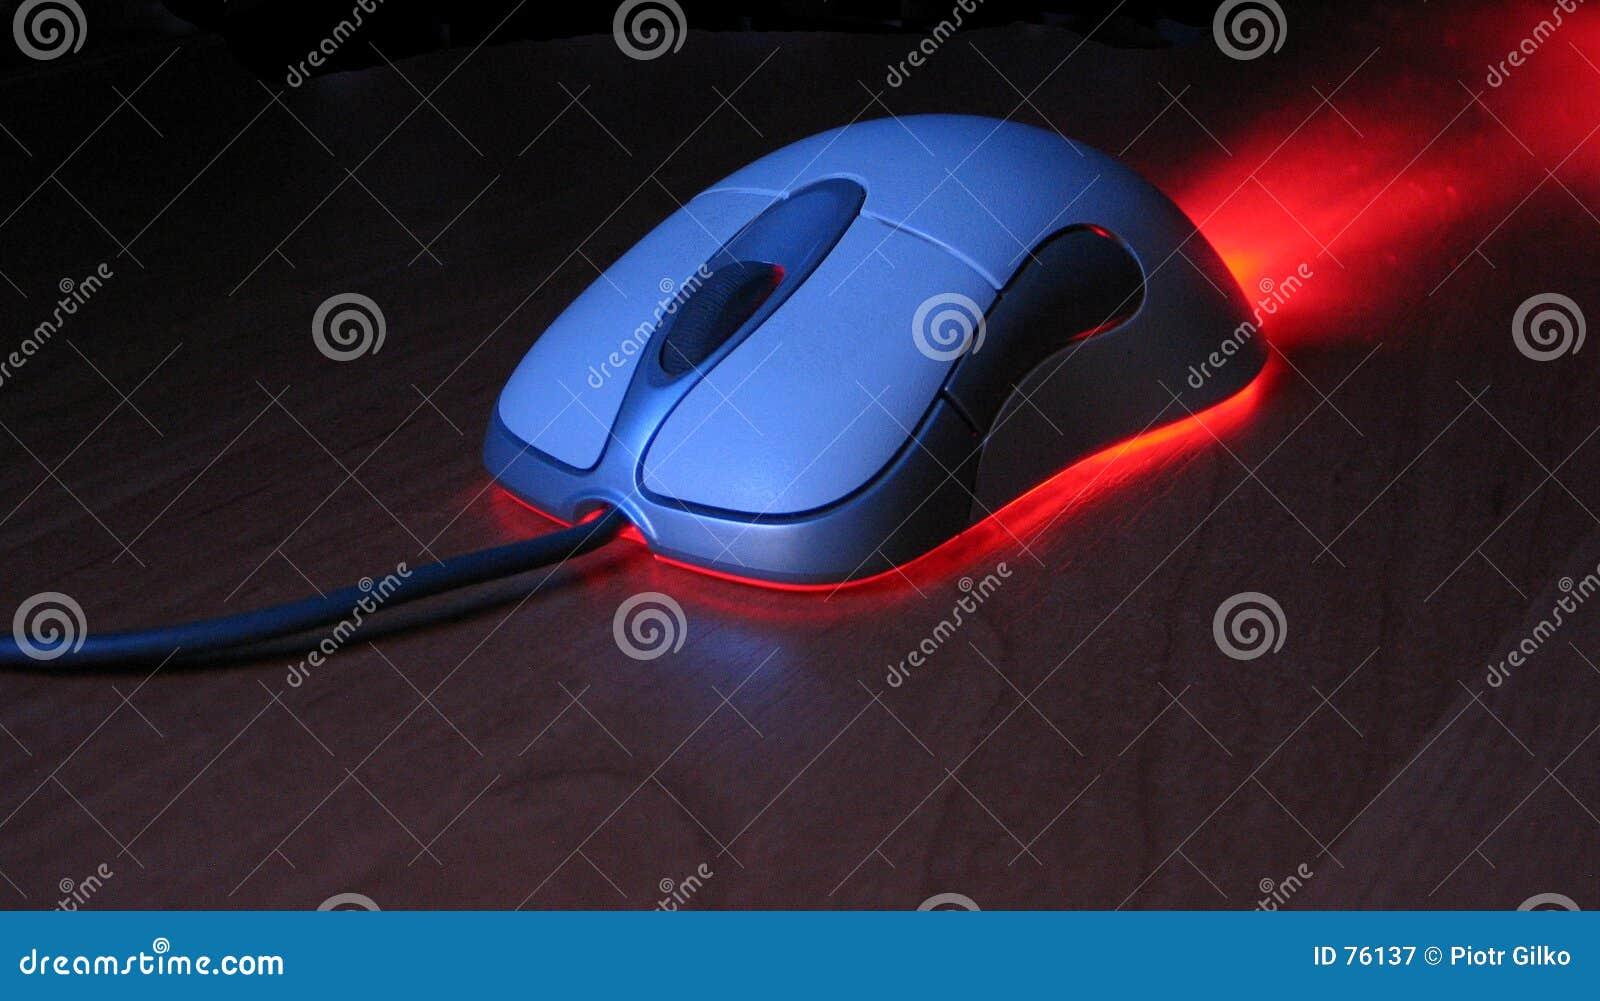 PC mouse.